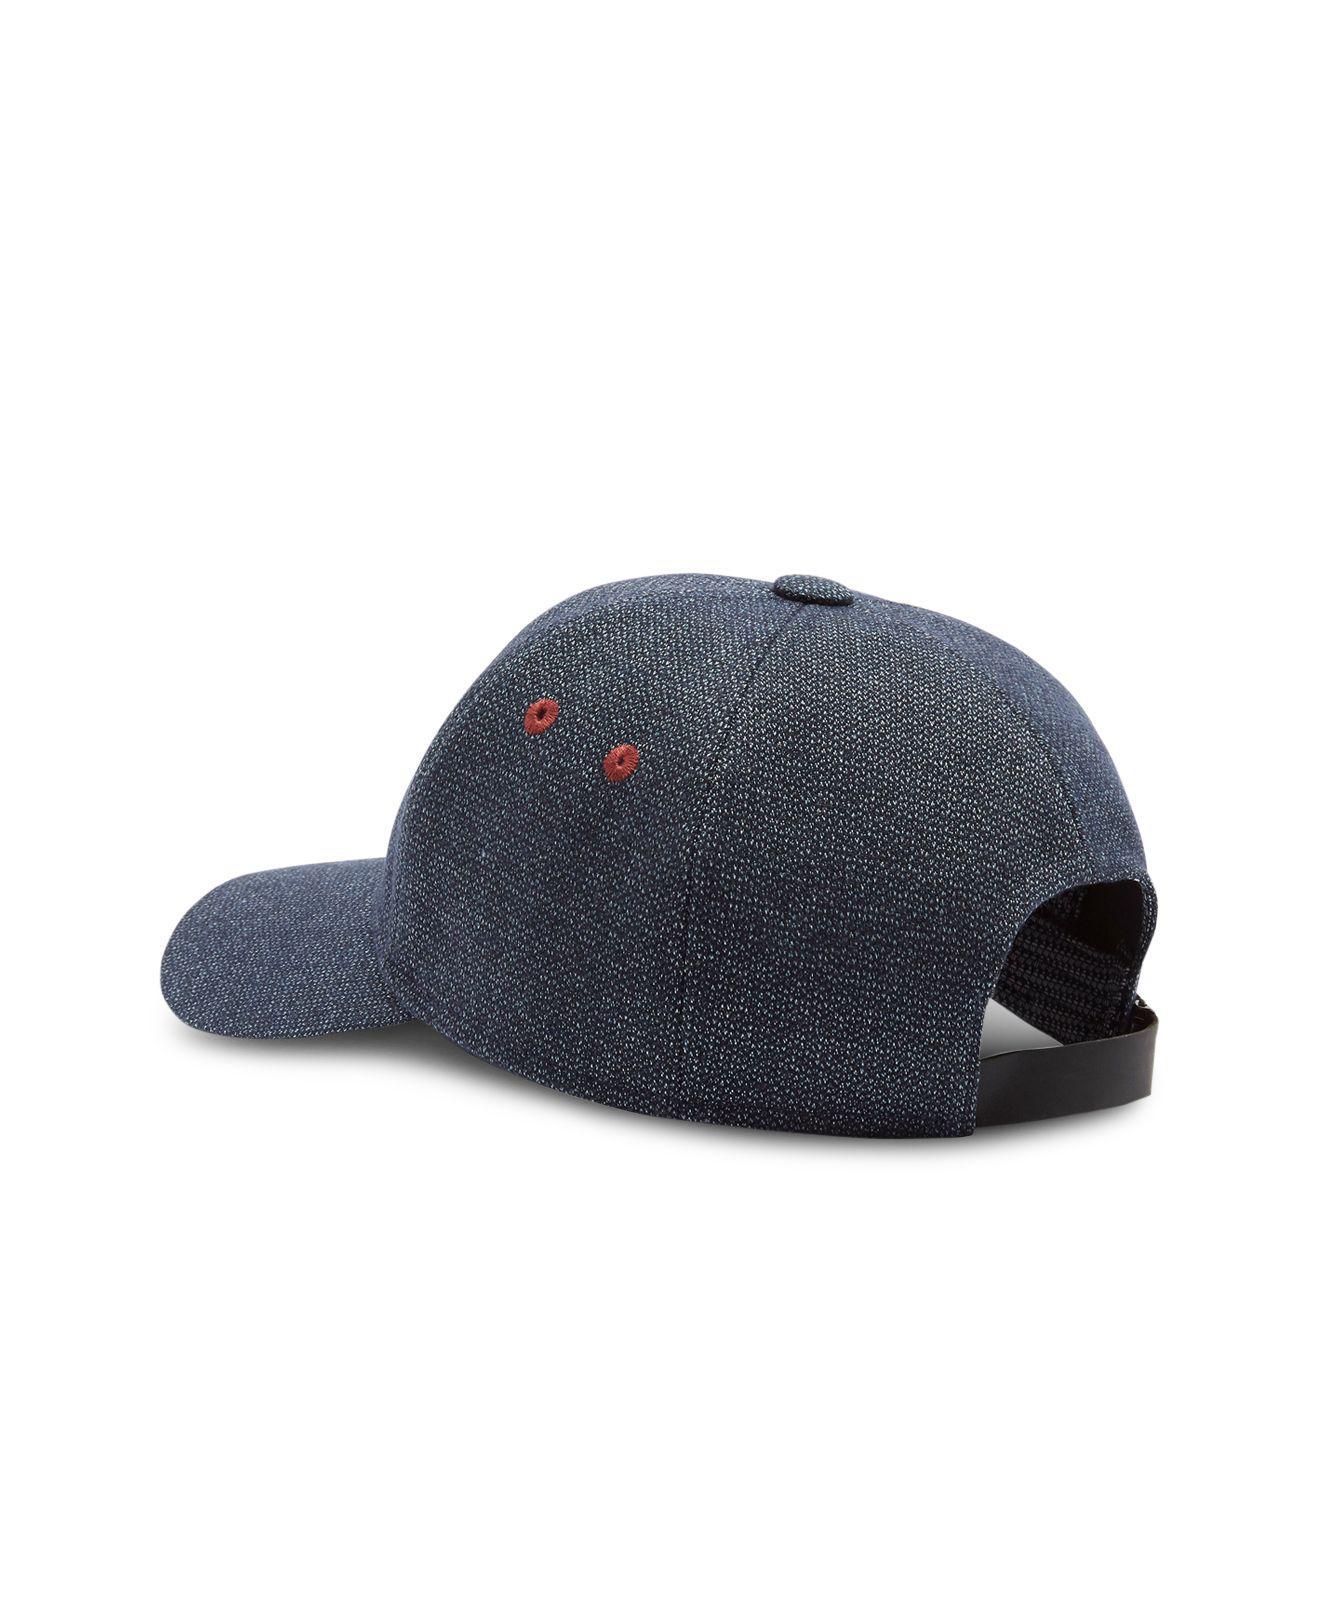 95856782348 Gallery. Previously sold at  Bloomingdale s · Men s Baseball Caps ...